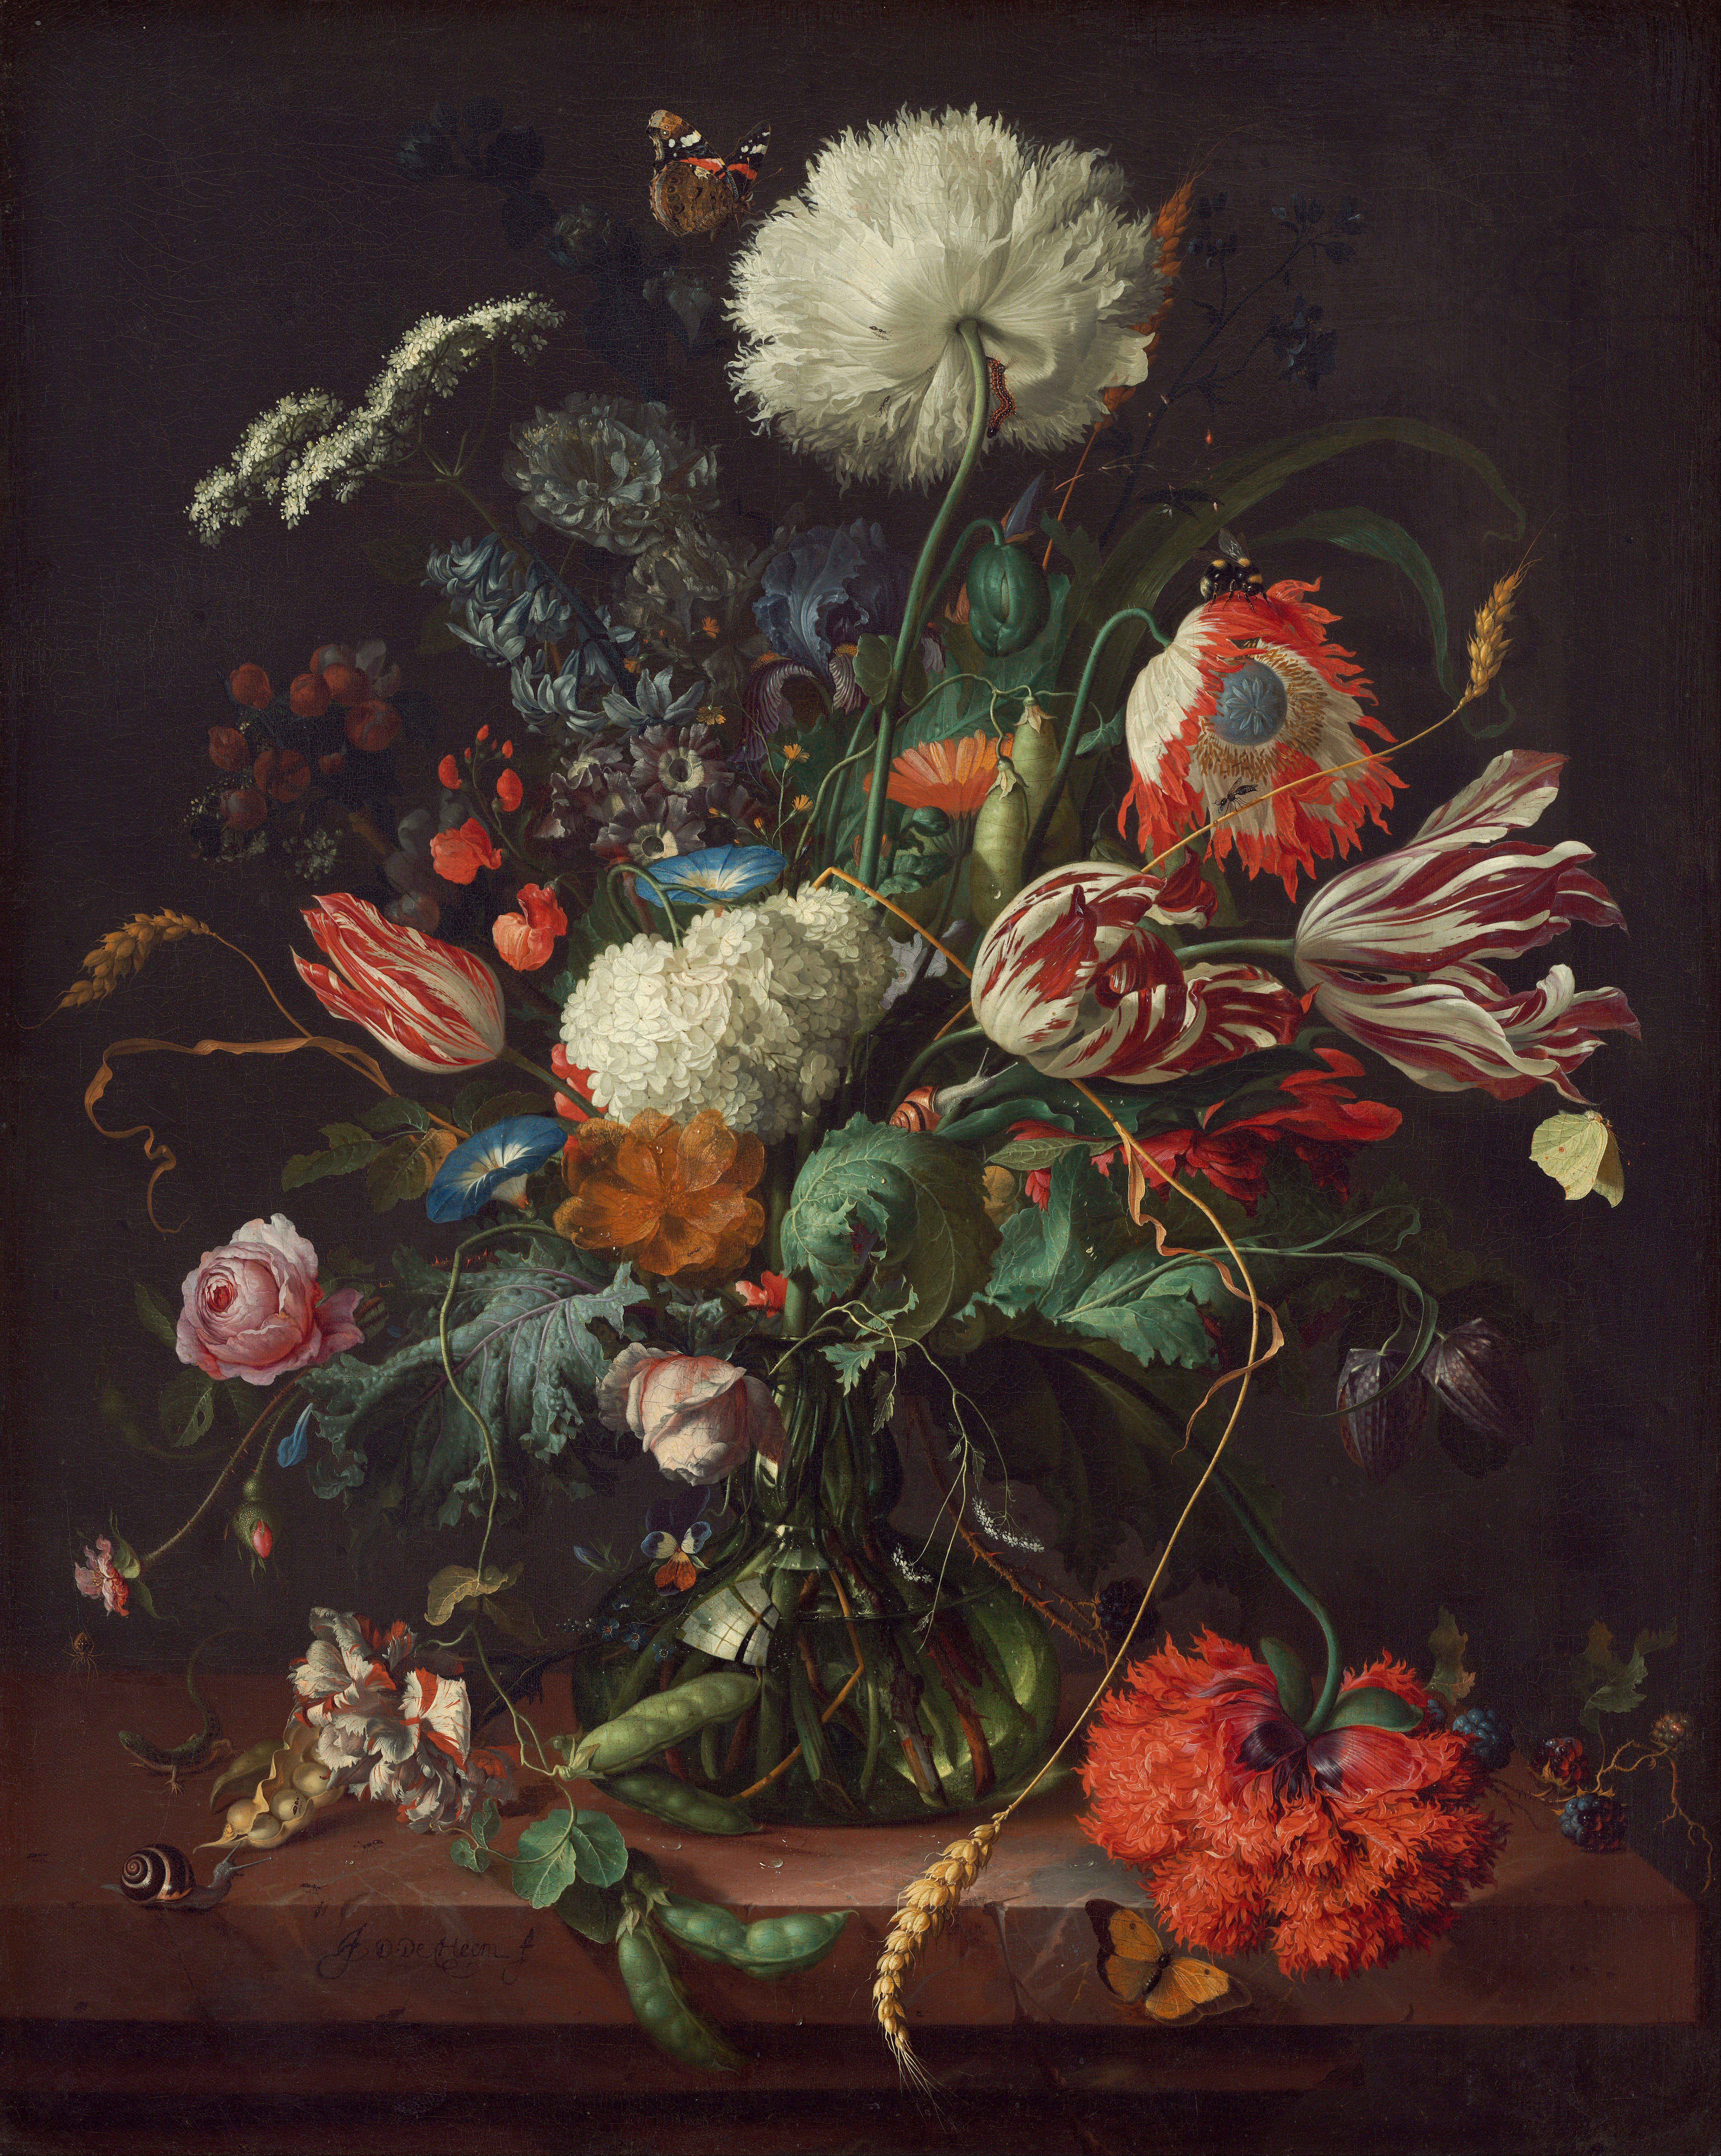 Jan_Davidsz_de_Heem_-_Vase_of_Flowers_-_Google_Art_Project